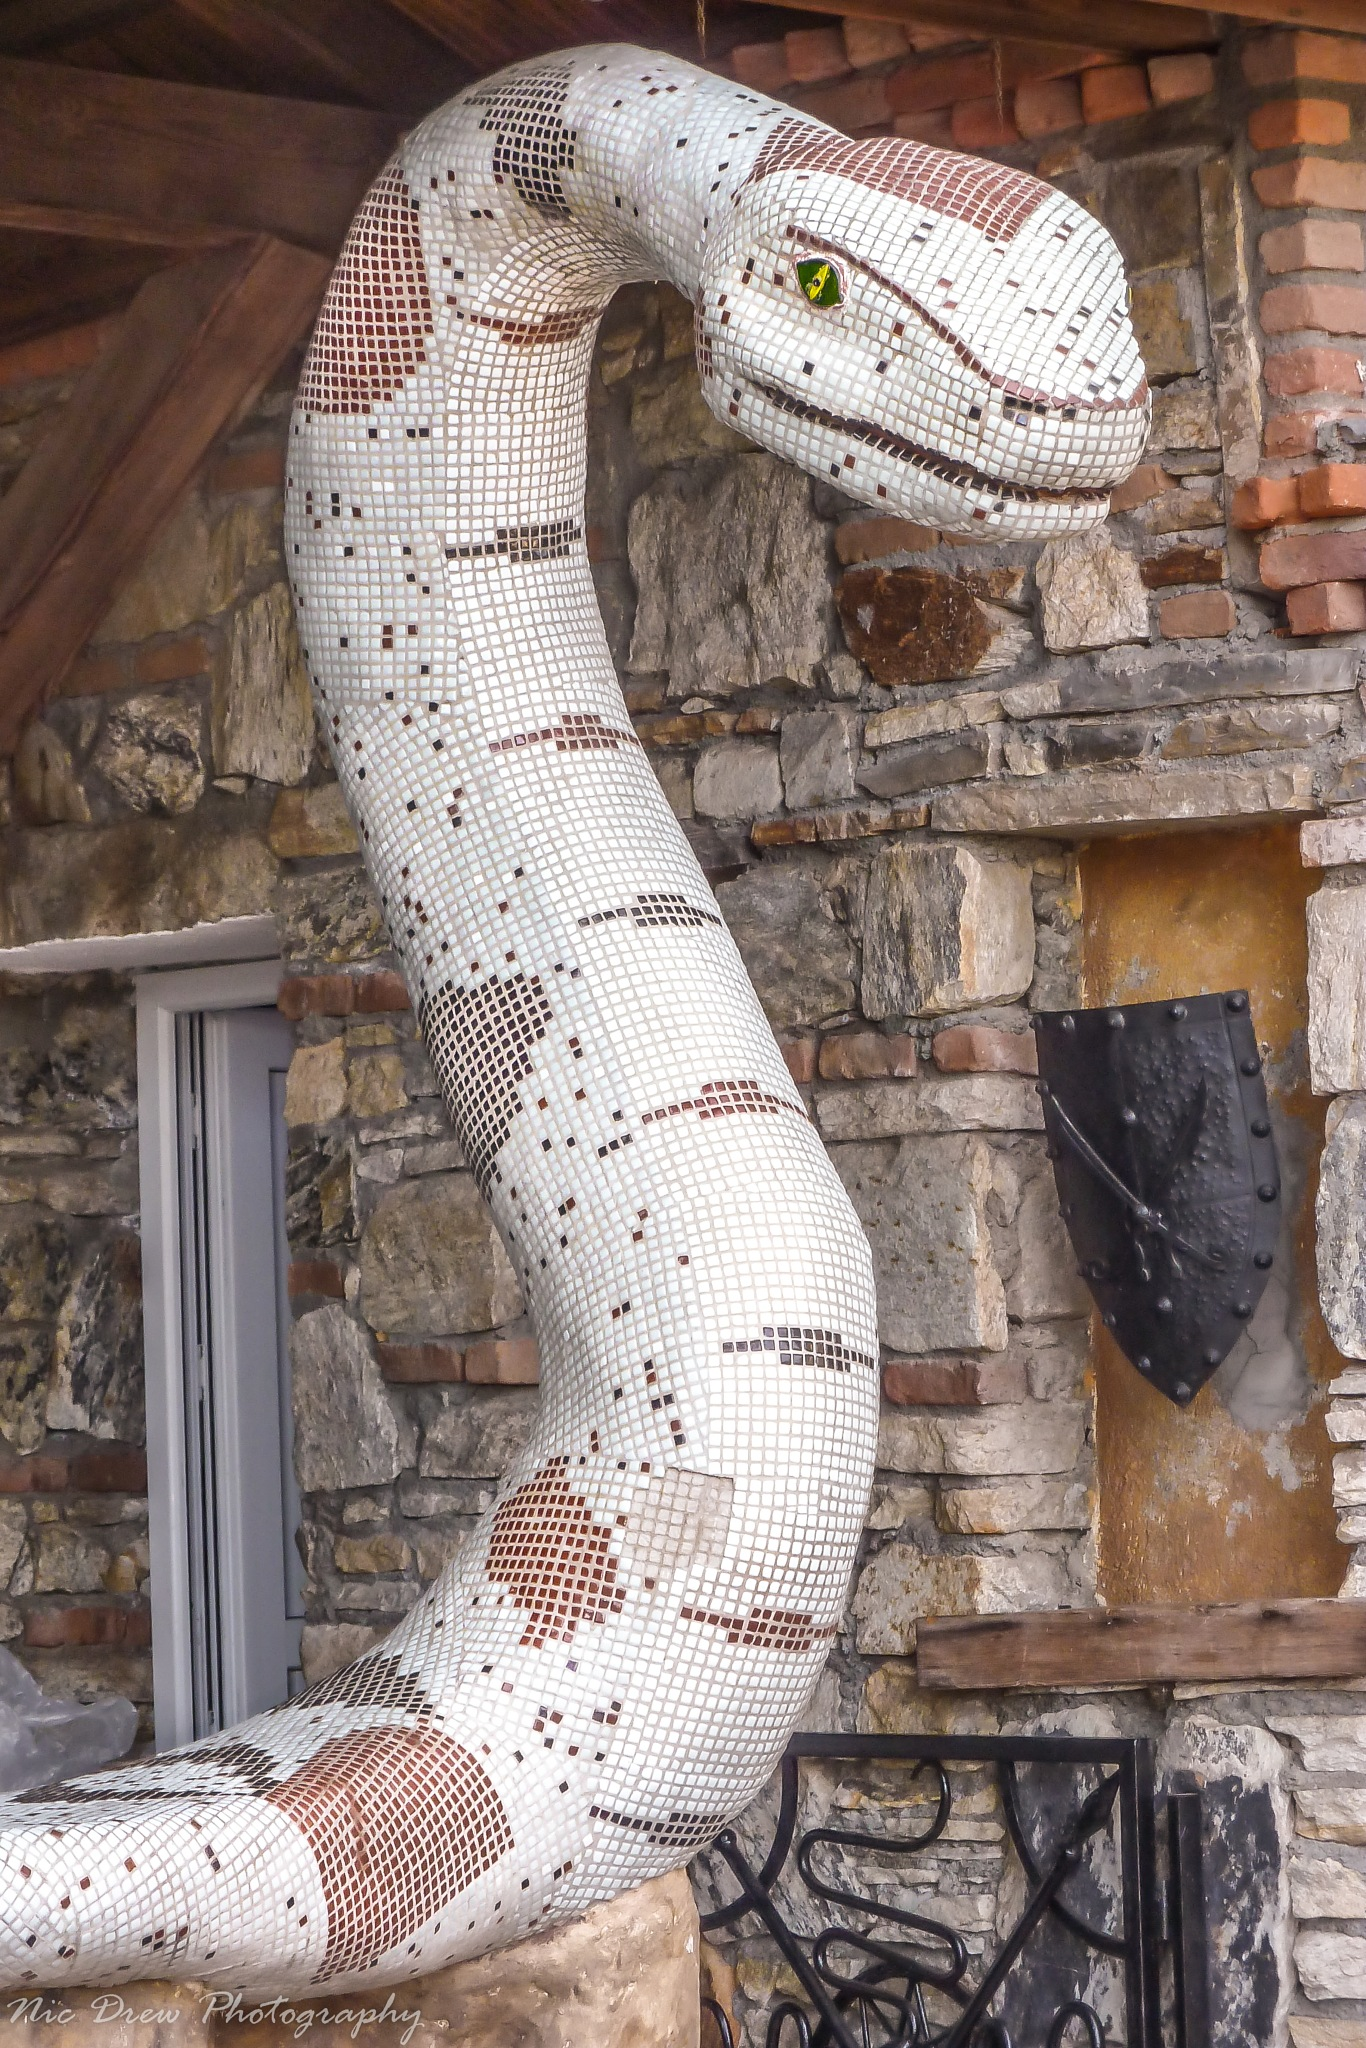 Snake by Nic Drew